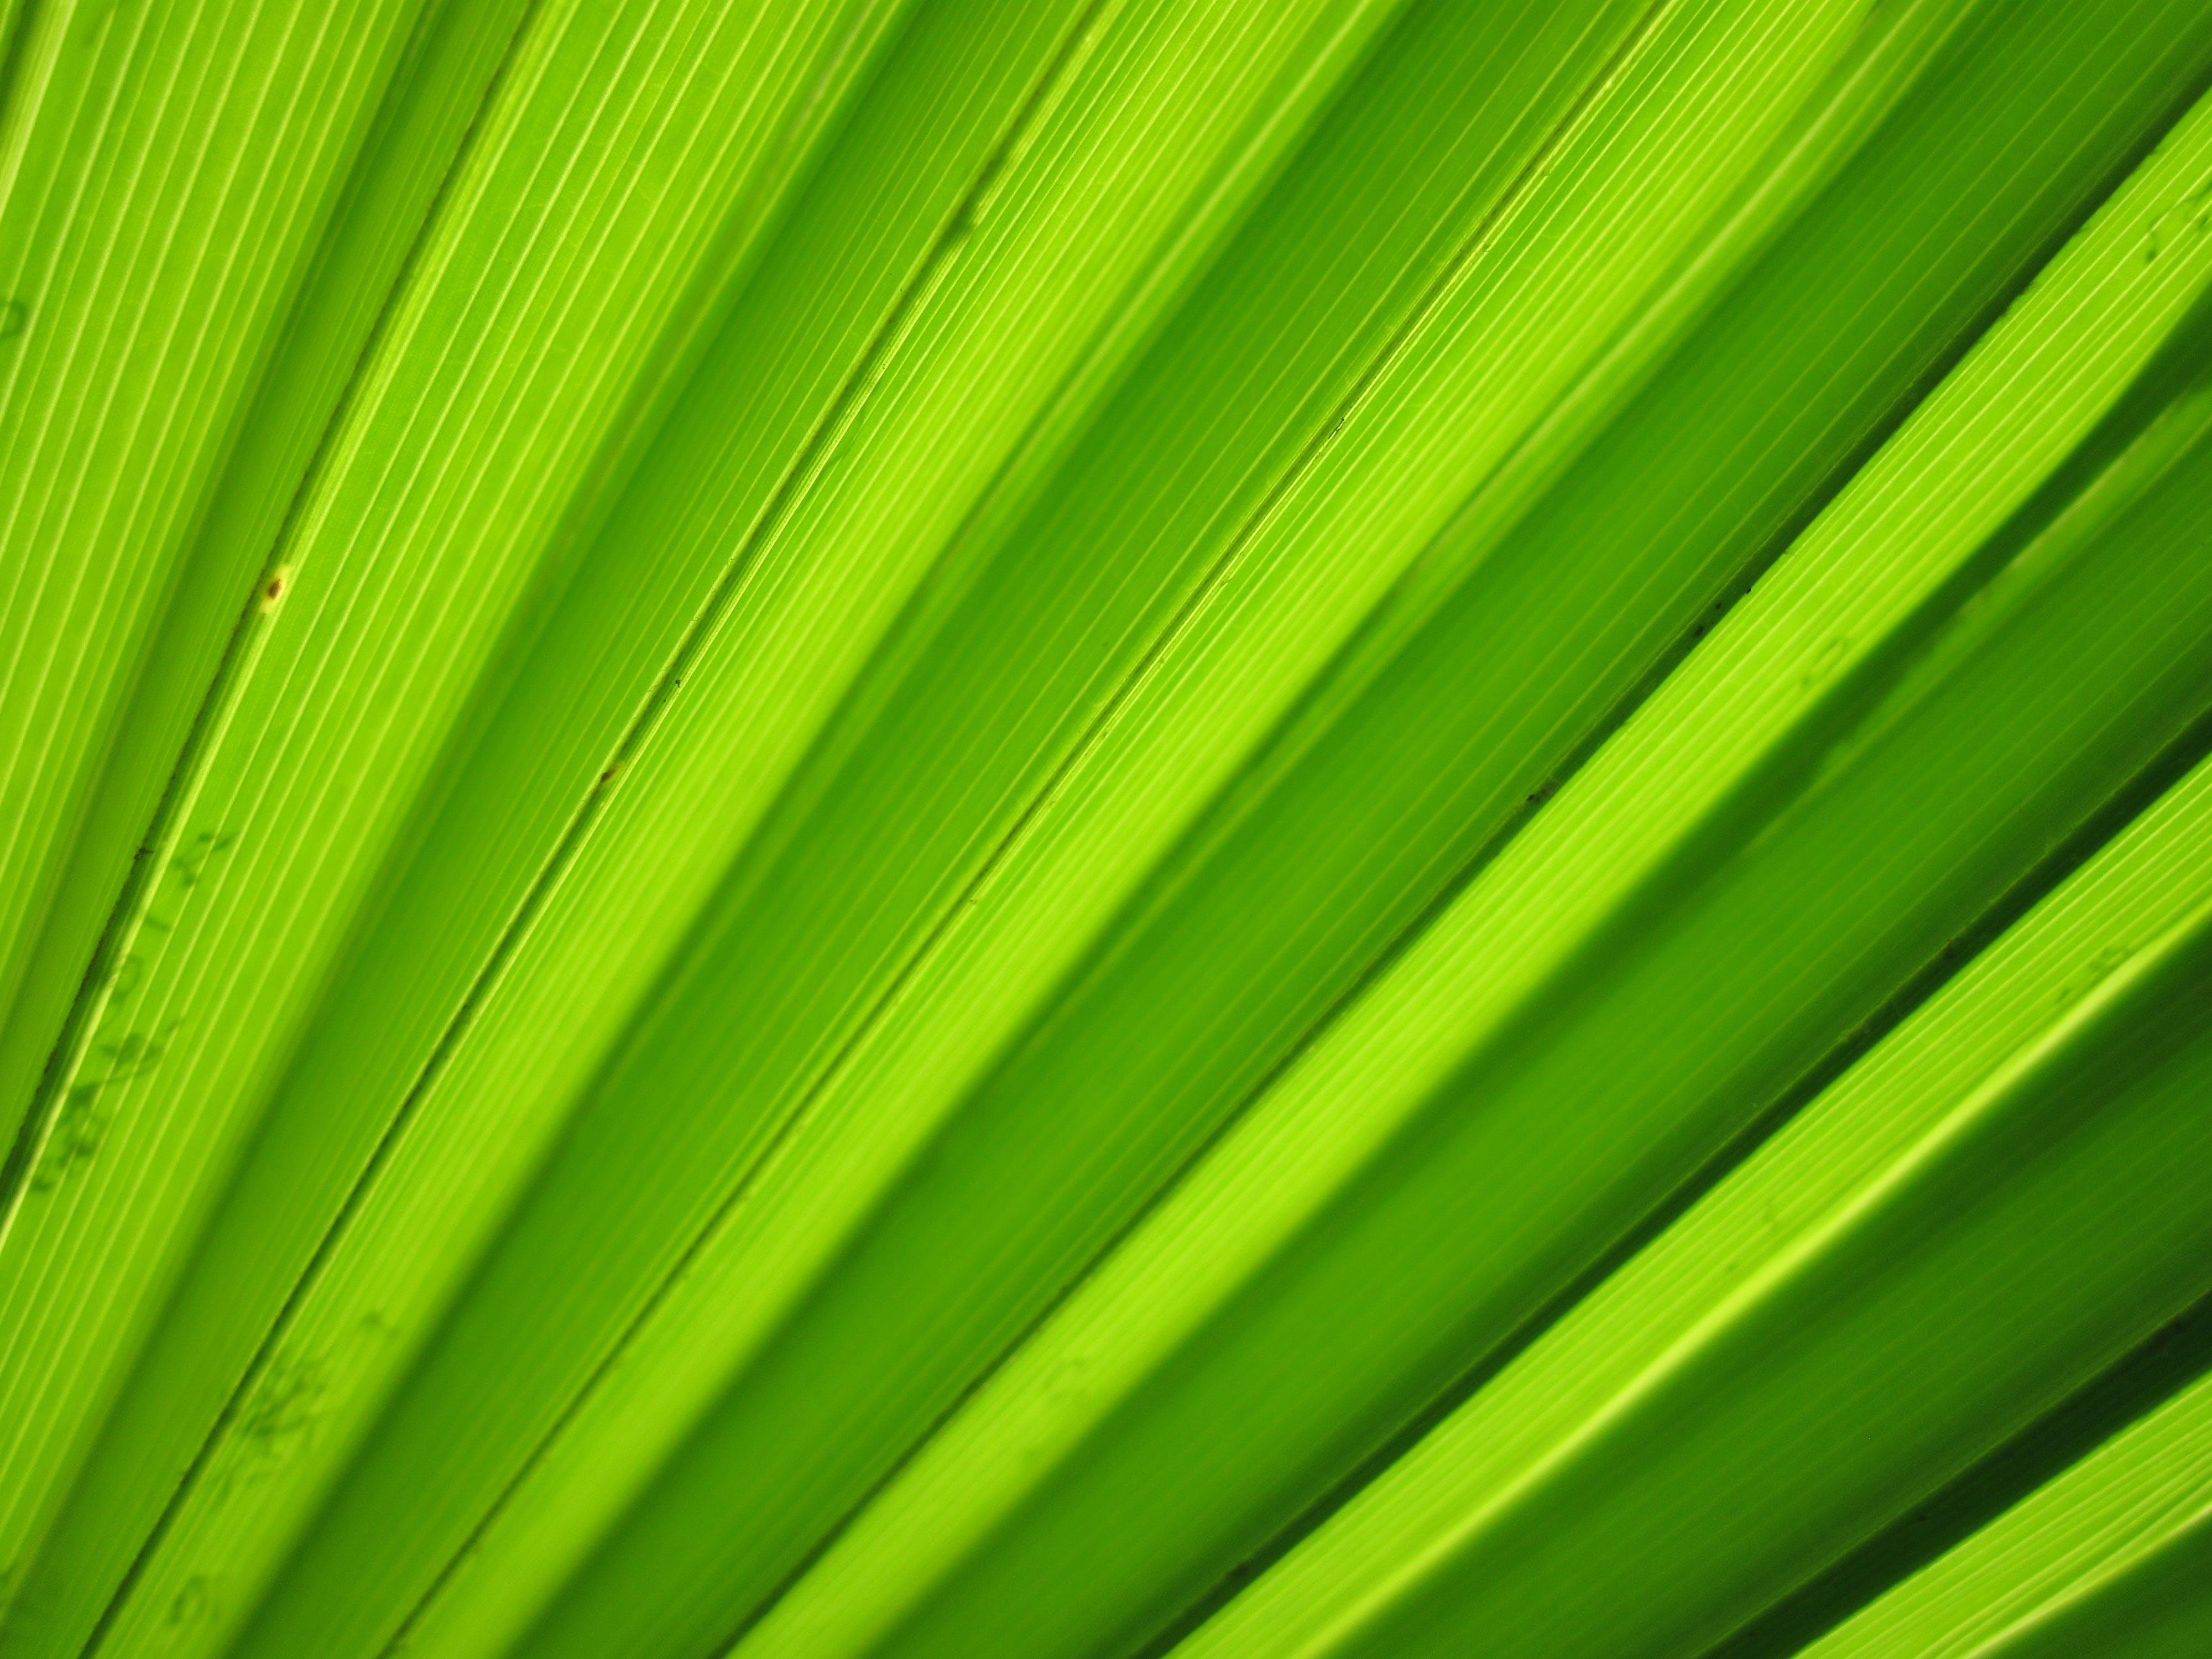 Kostenloses Stock Foto zu baum, flora, grün, makro